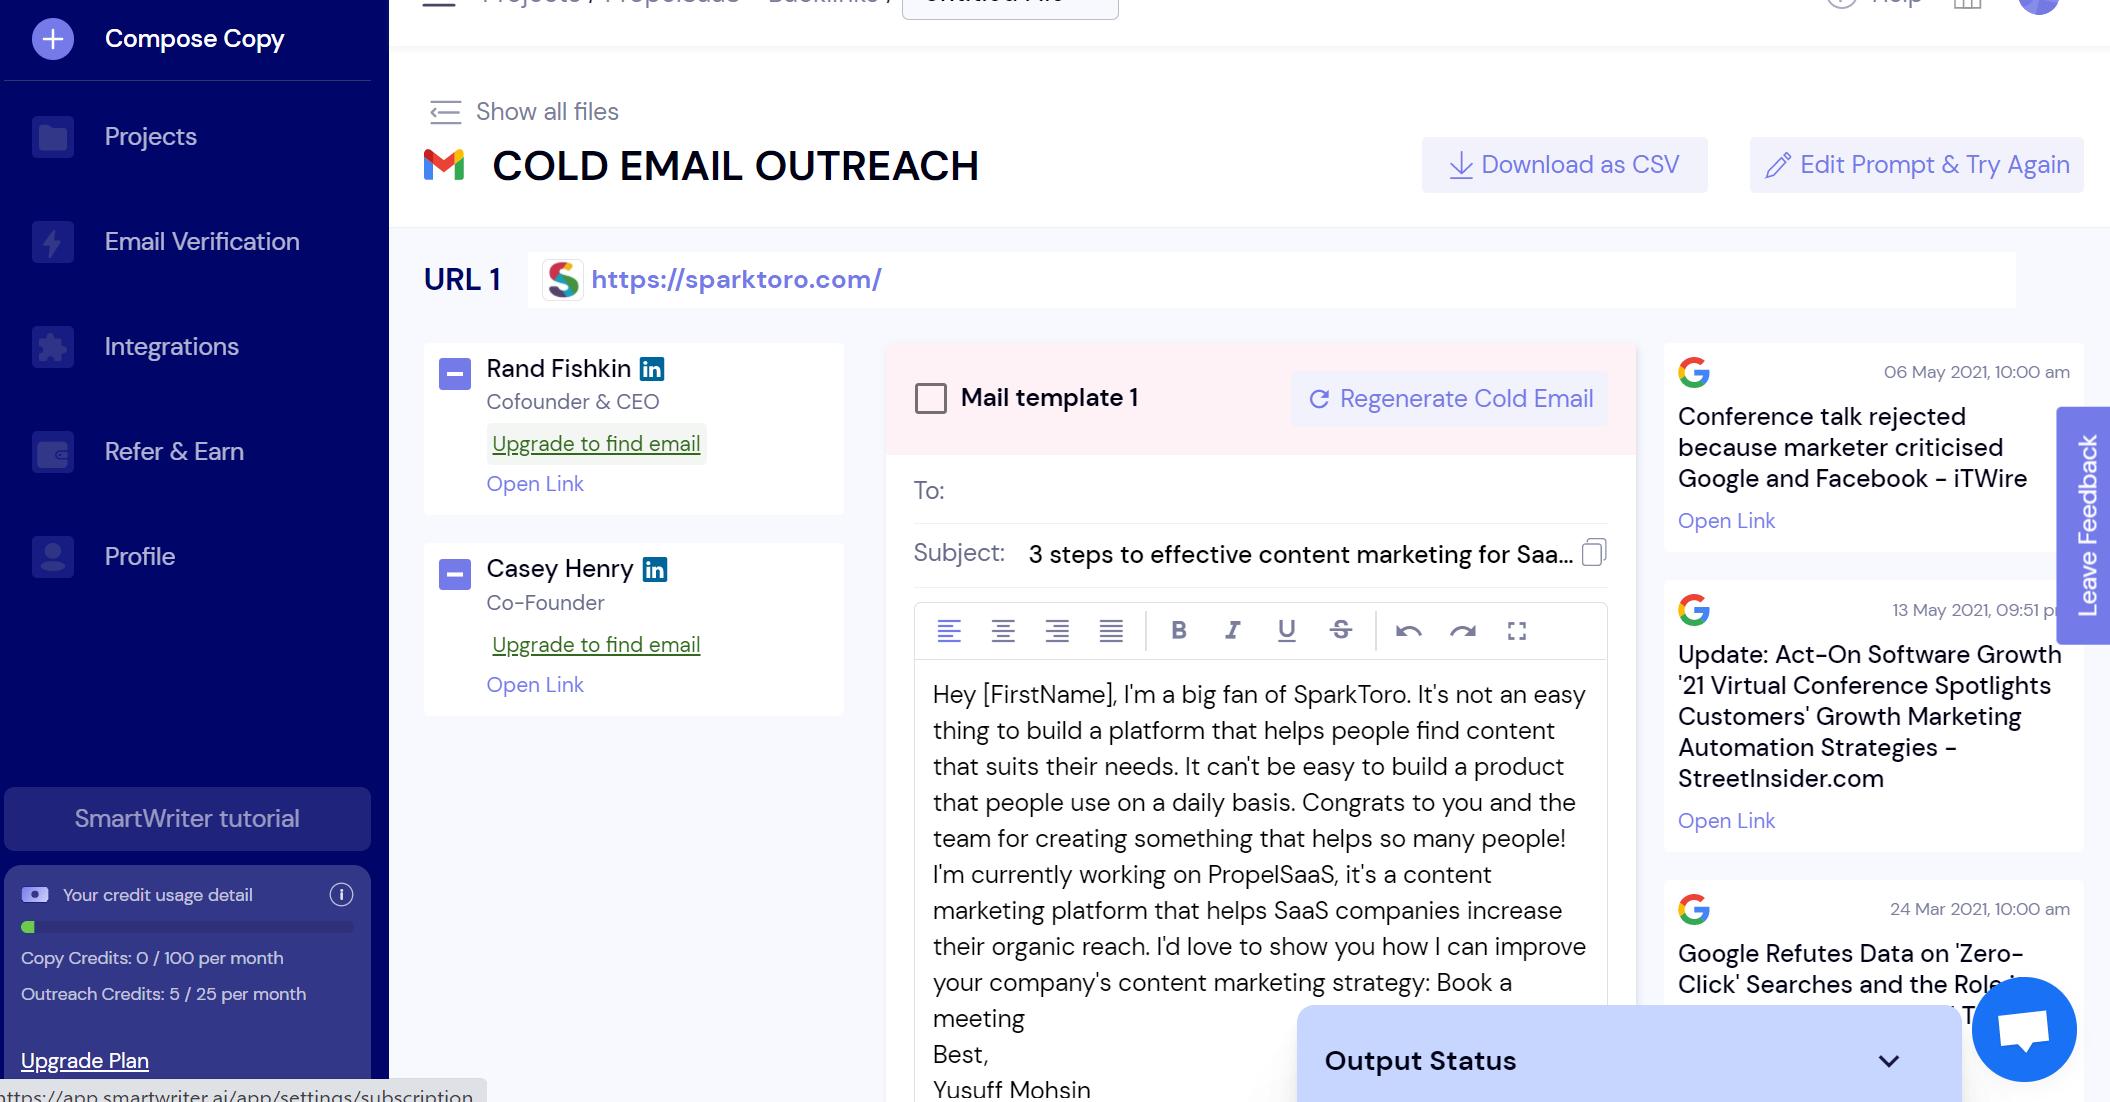 SmartWriter - Cold Email Copy